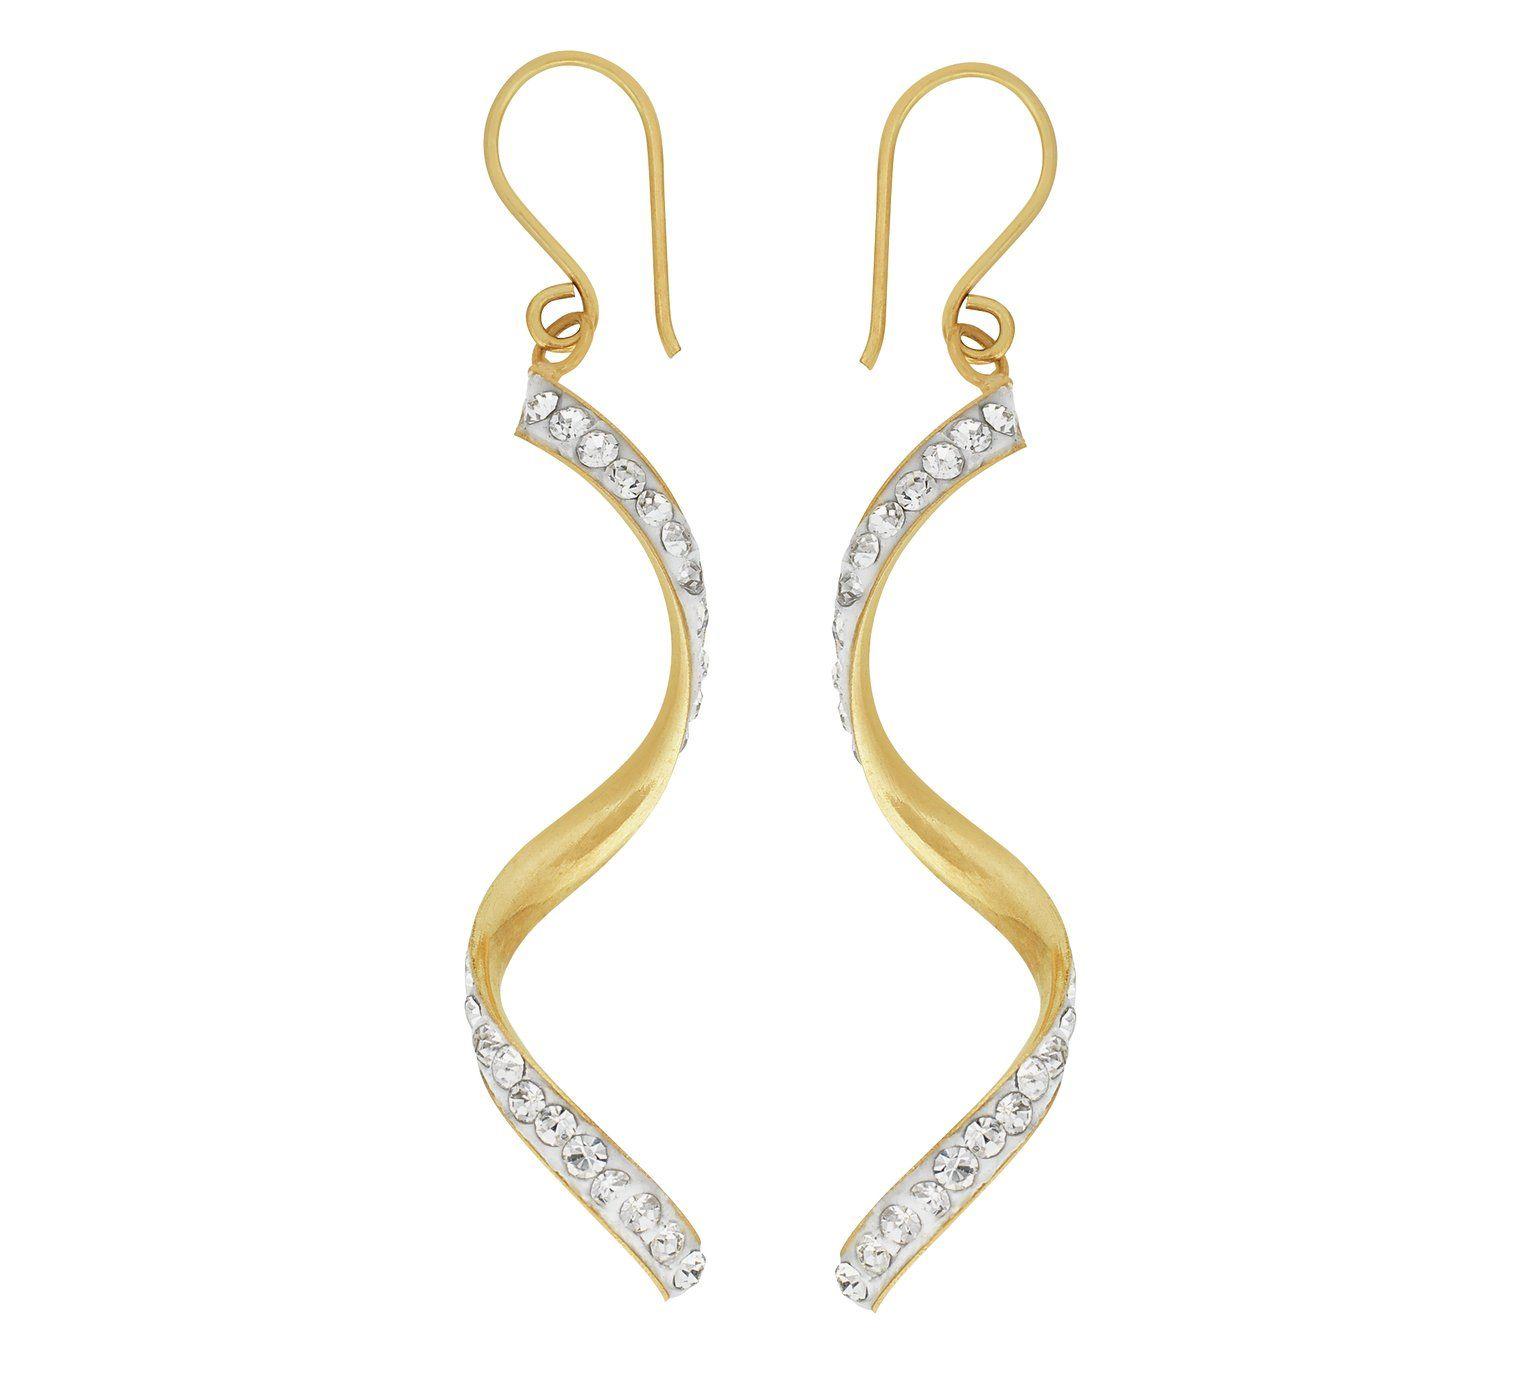 Revere 9ct Gold Cubic Zirconia Twist Drop Earrings At Argos Co Uk